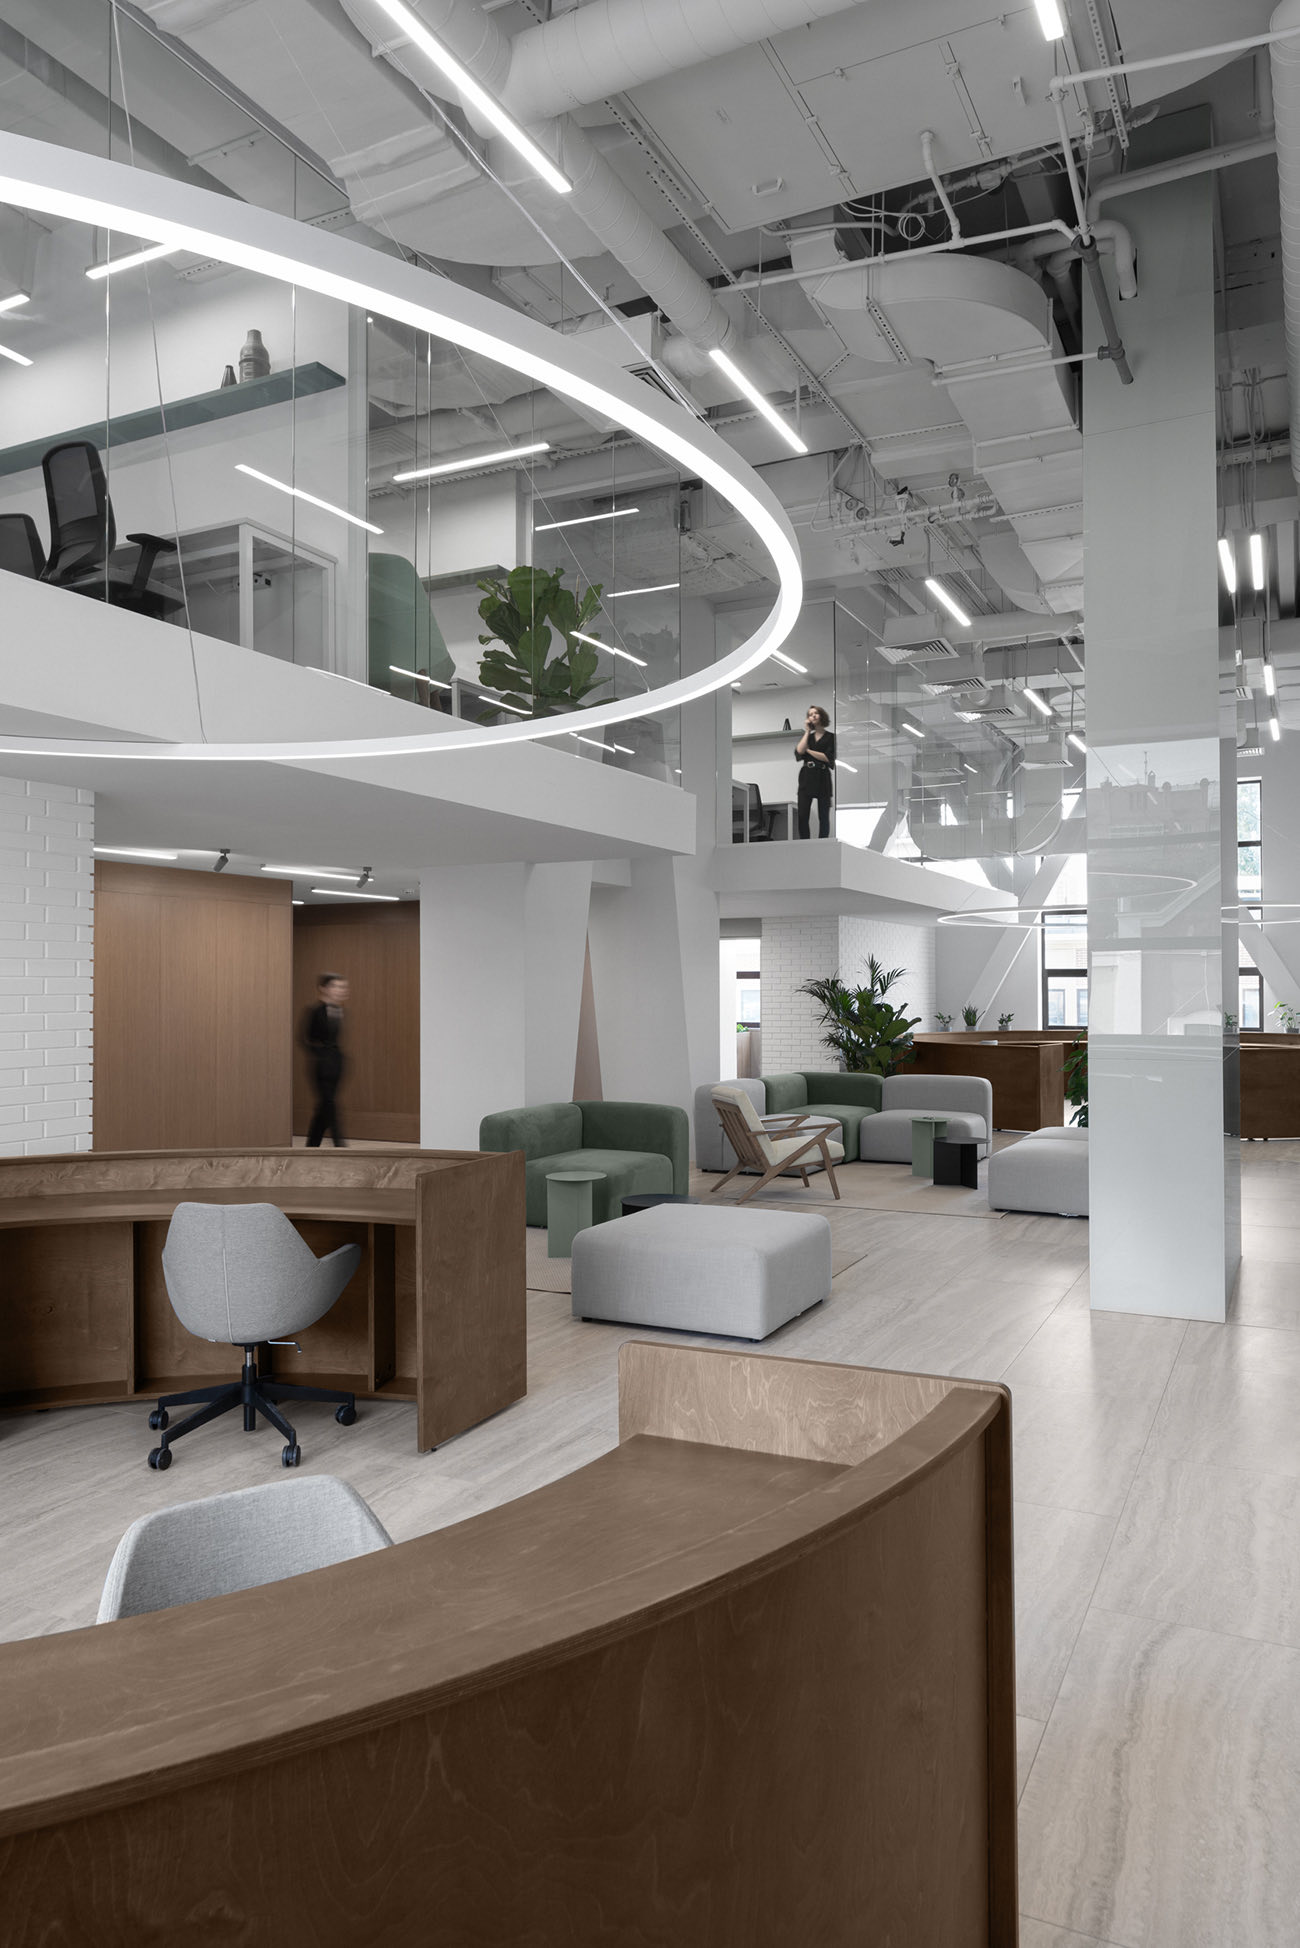 praktik-coworking-space-minsk-12